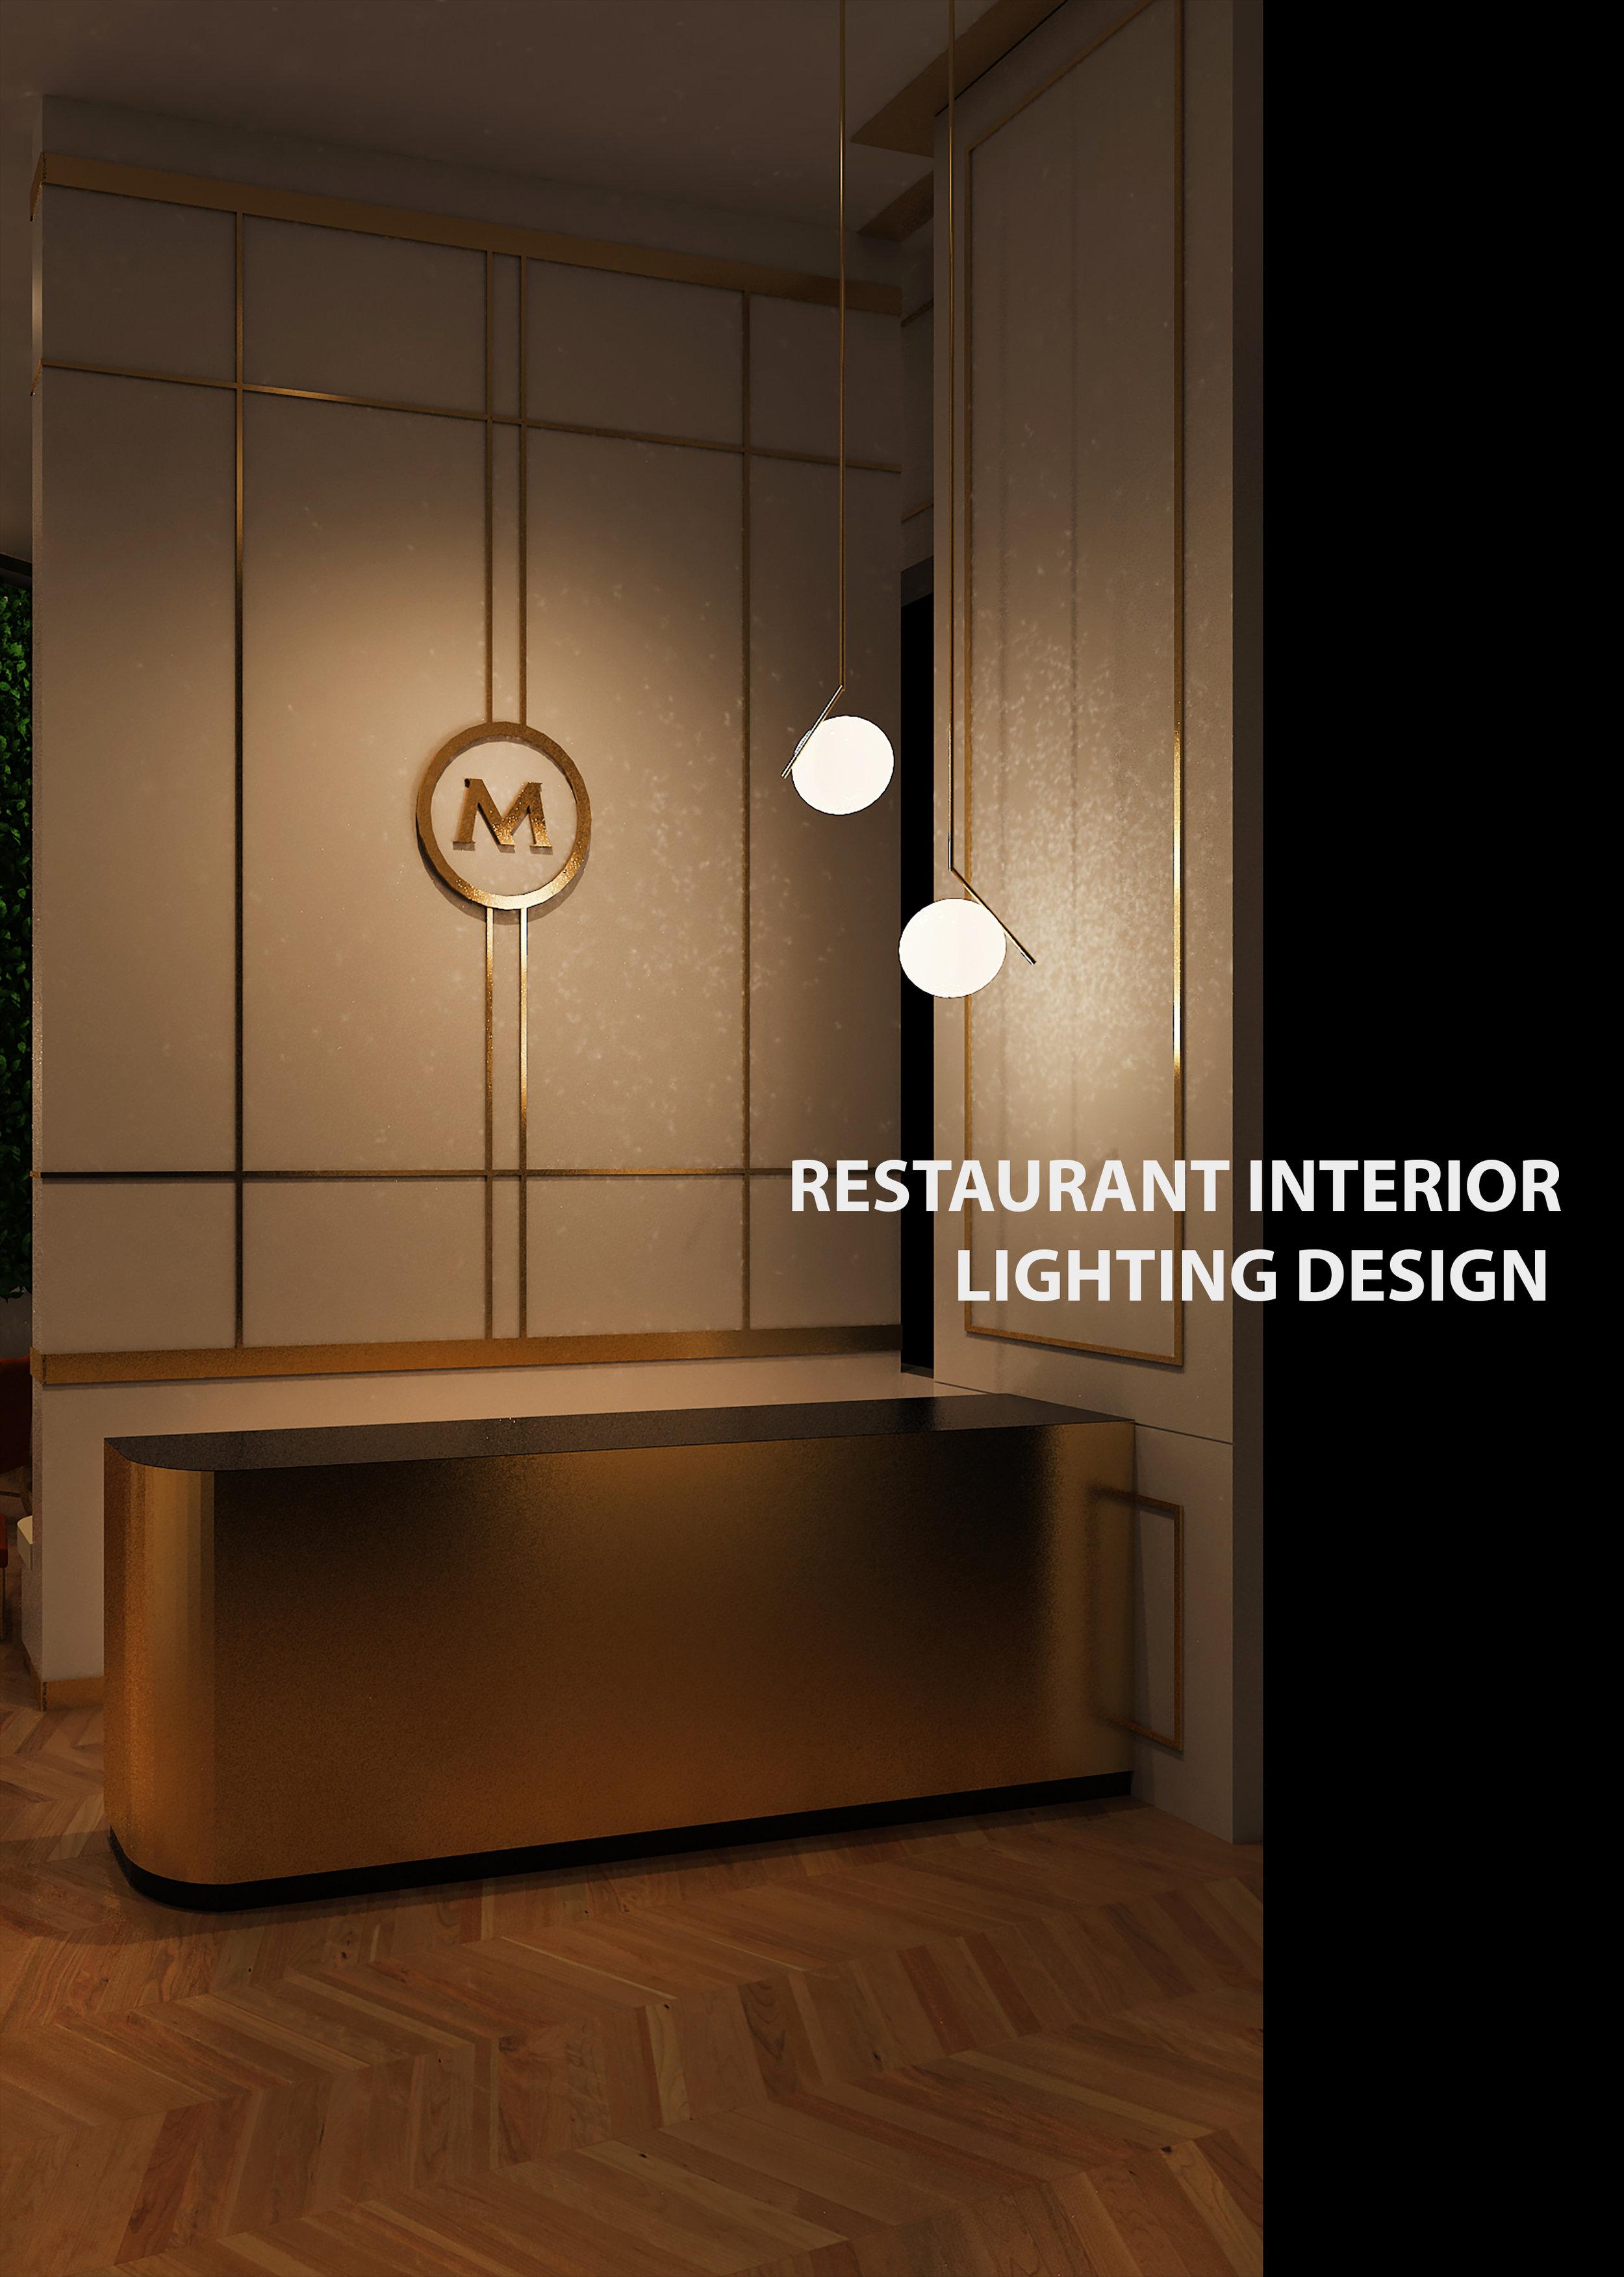 phatthanan-kasemtreerat-mps-l-restaurant-interior-lighting-design_34479504473_o.jpg